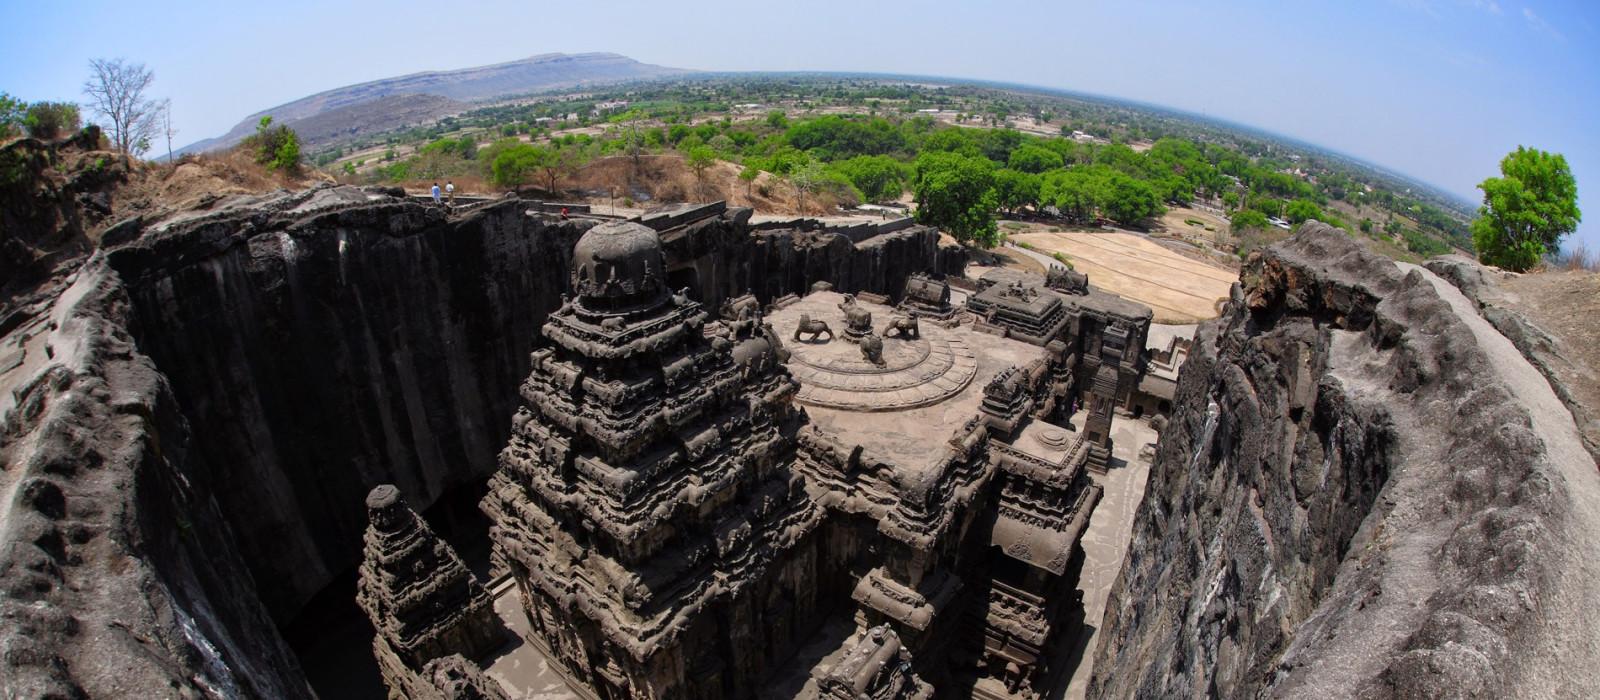 Reiseziel Aurangabad Zentral- & Westindien